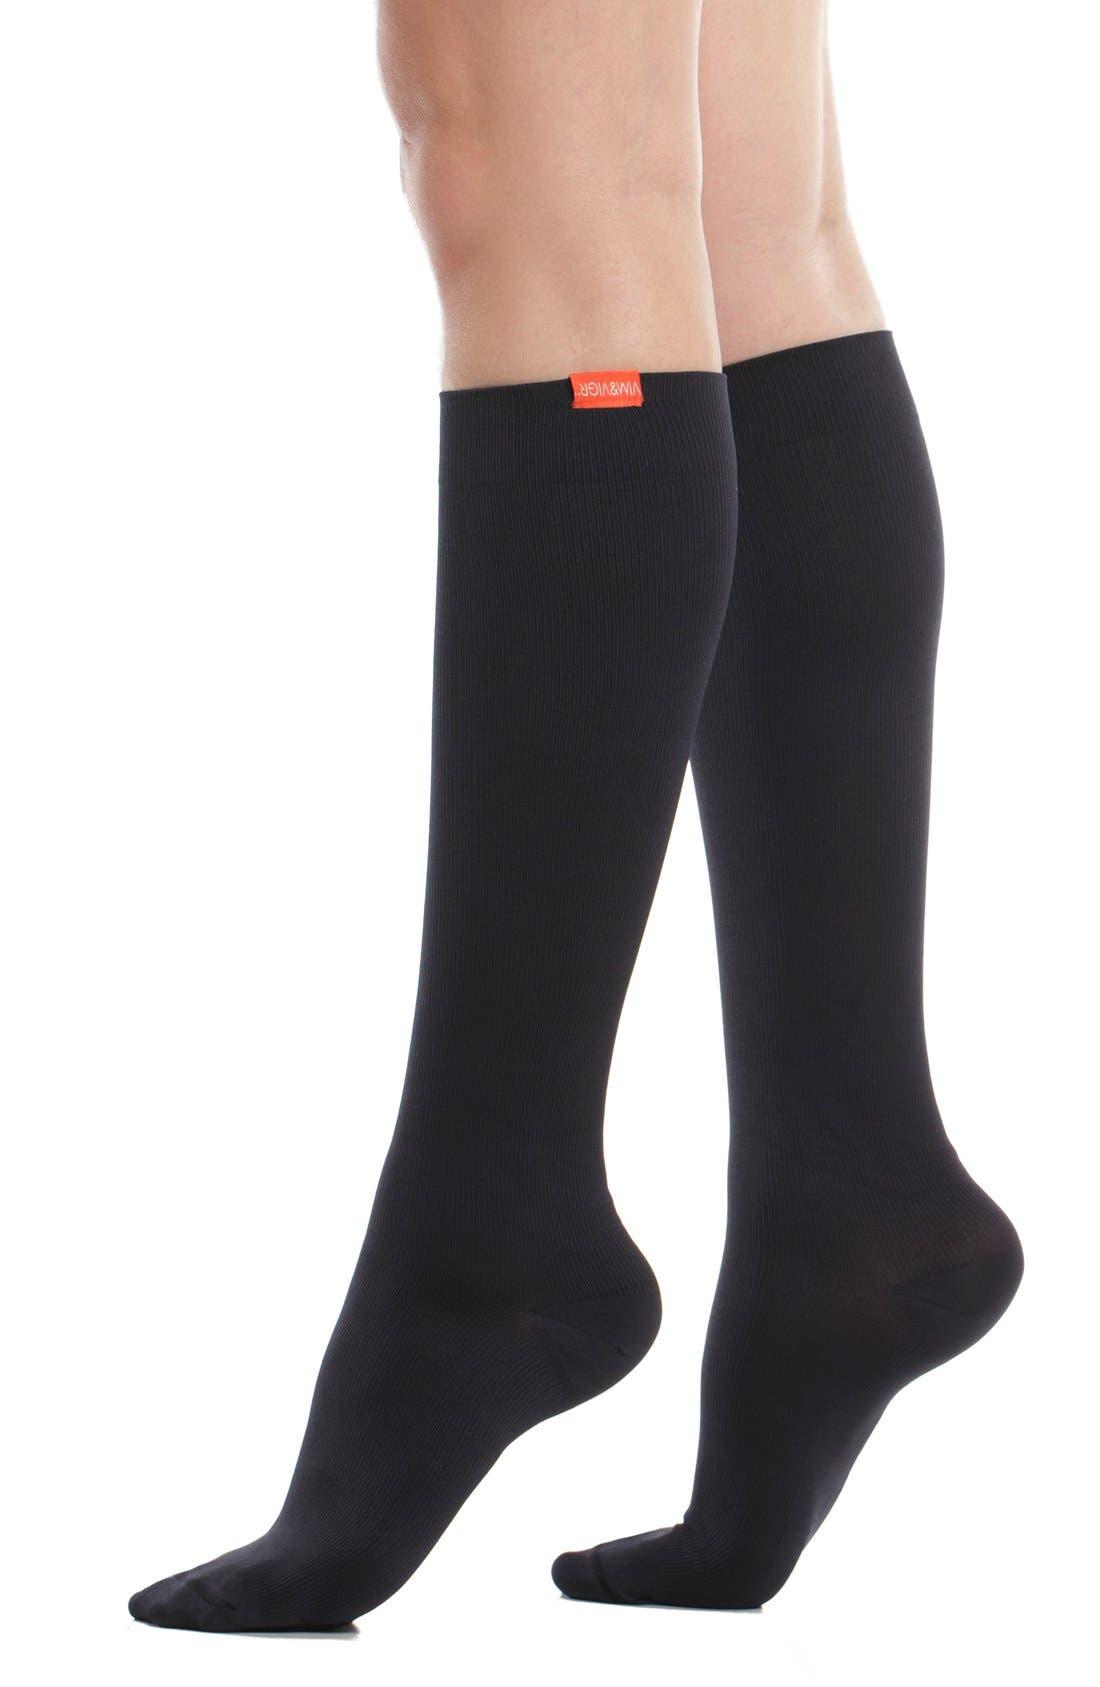 Solid Graduated Compression Trouser Socks,                             Main thumbnail 1, color,                             BLACK